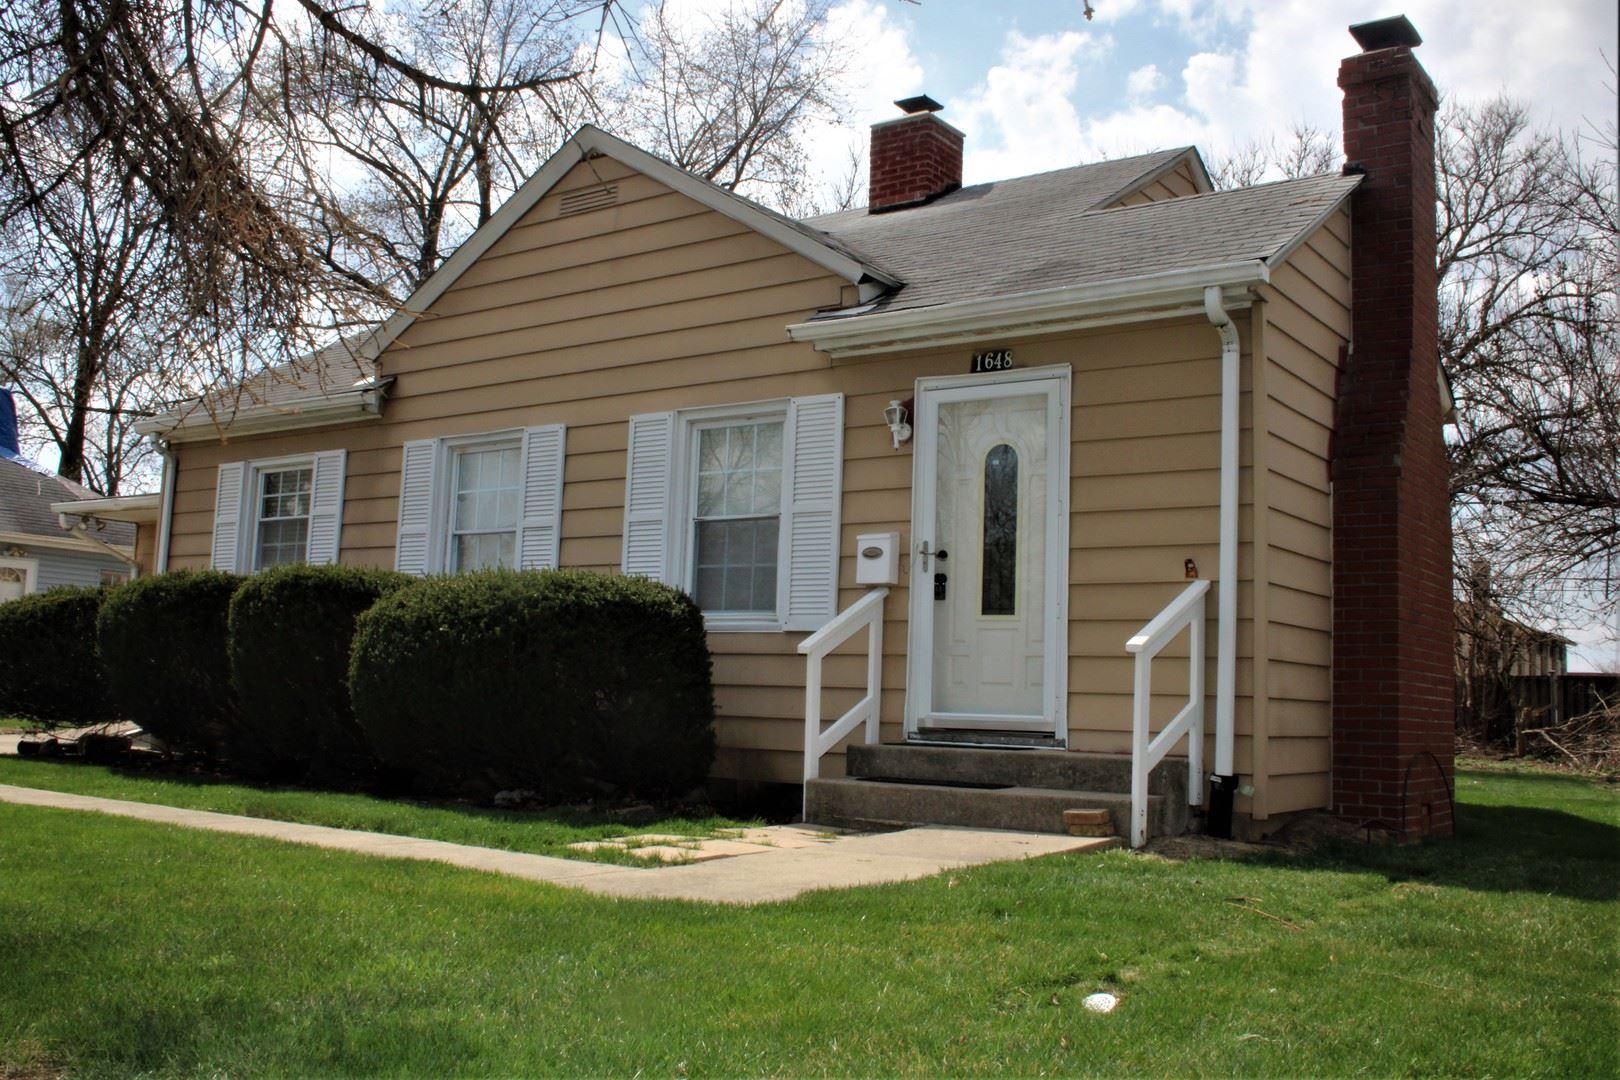 Photo of 1648 Marquette Road, Joliet, IL 60435 (MLS # 11054145)